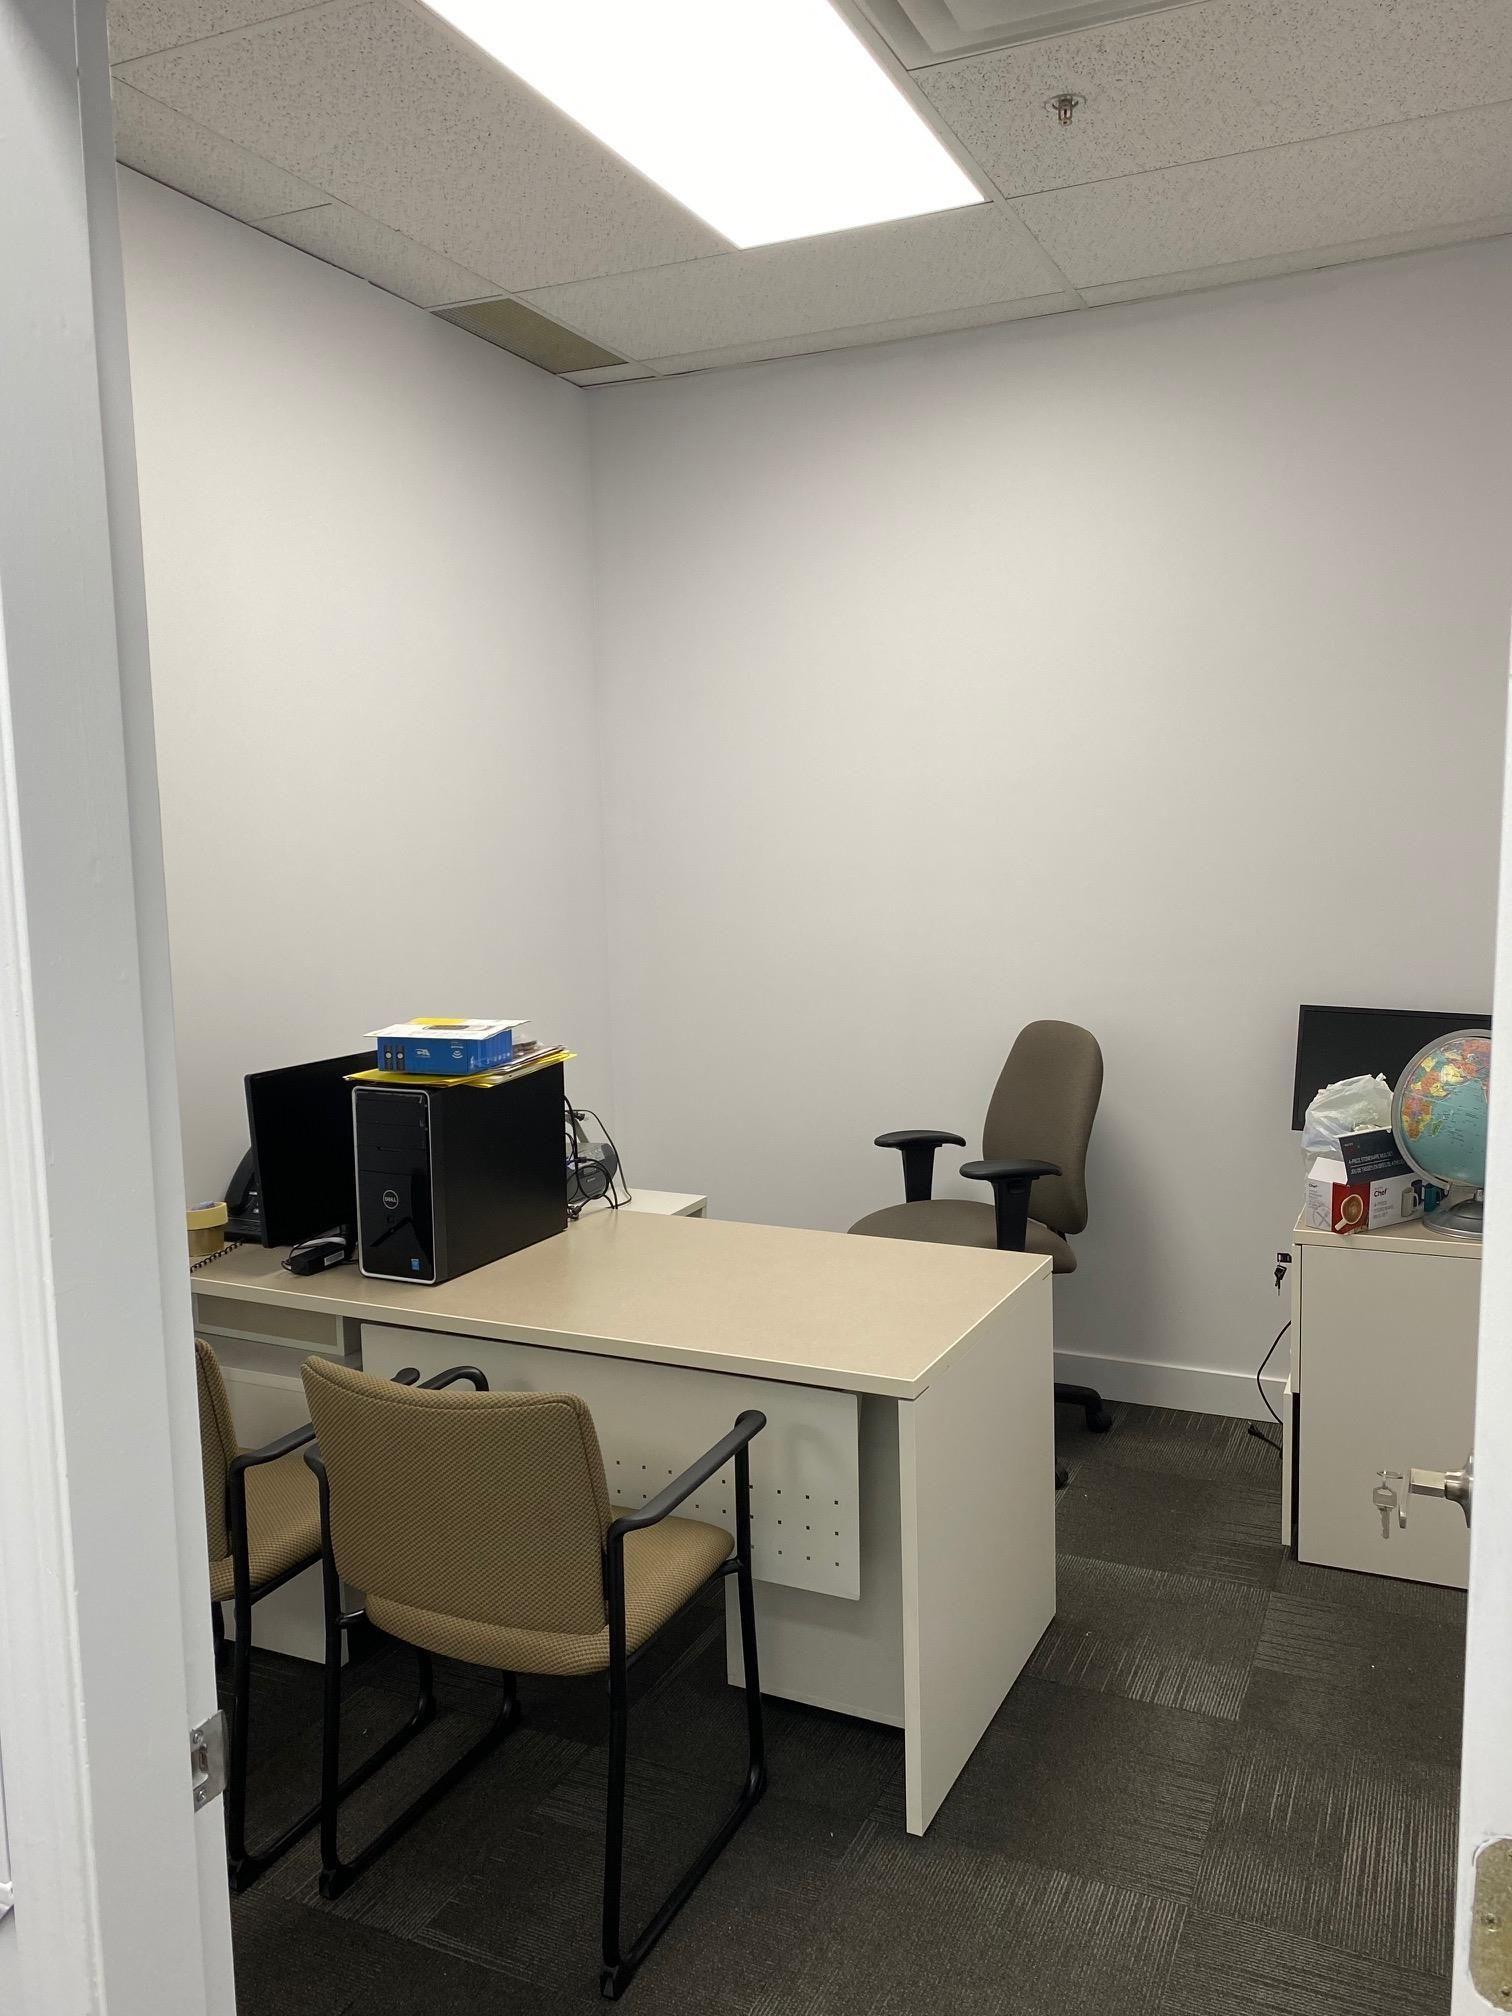 Main Photo: 203 8334 128 Street in Surrey: Queen Mary Park Surrey Office for sale : MLS®# C8040556